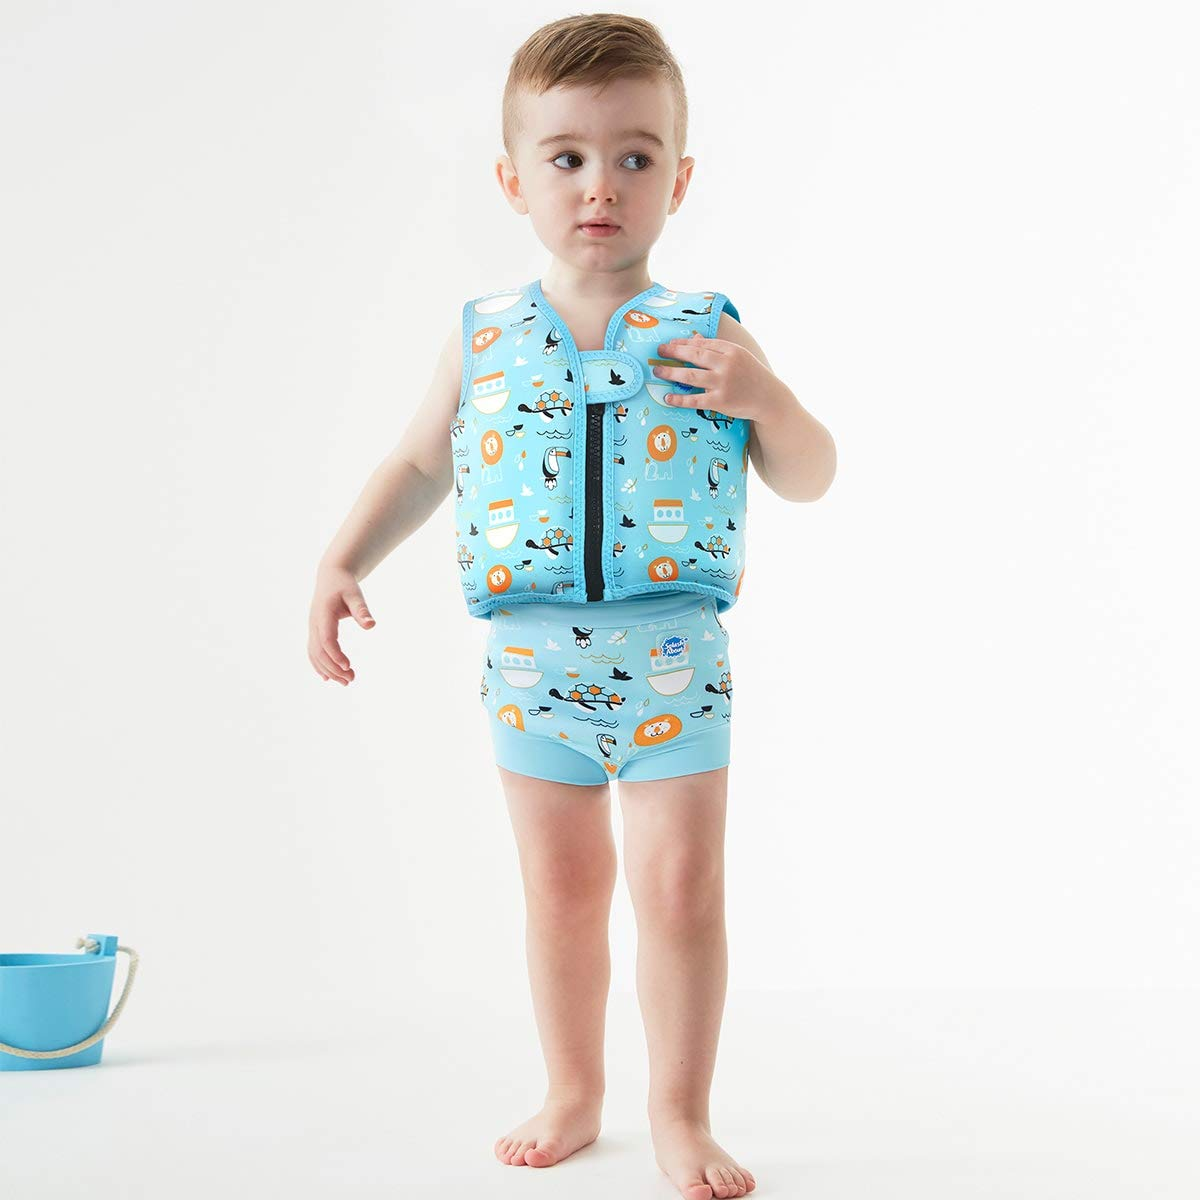 Infantil Splash About Chaleco de nataci/ón Kids Go Splash